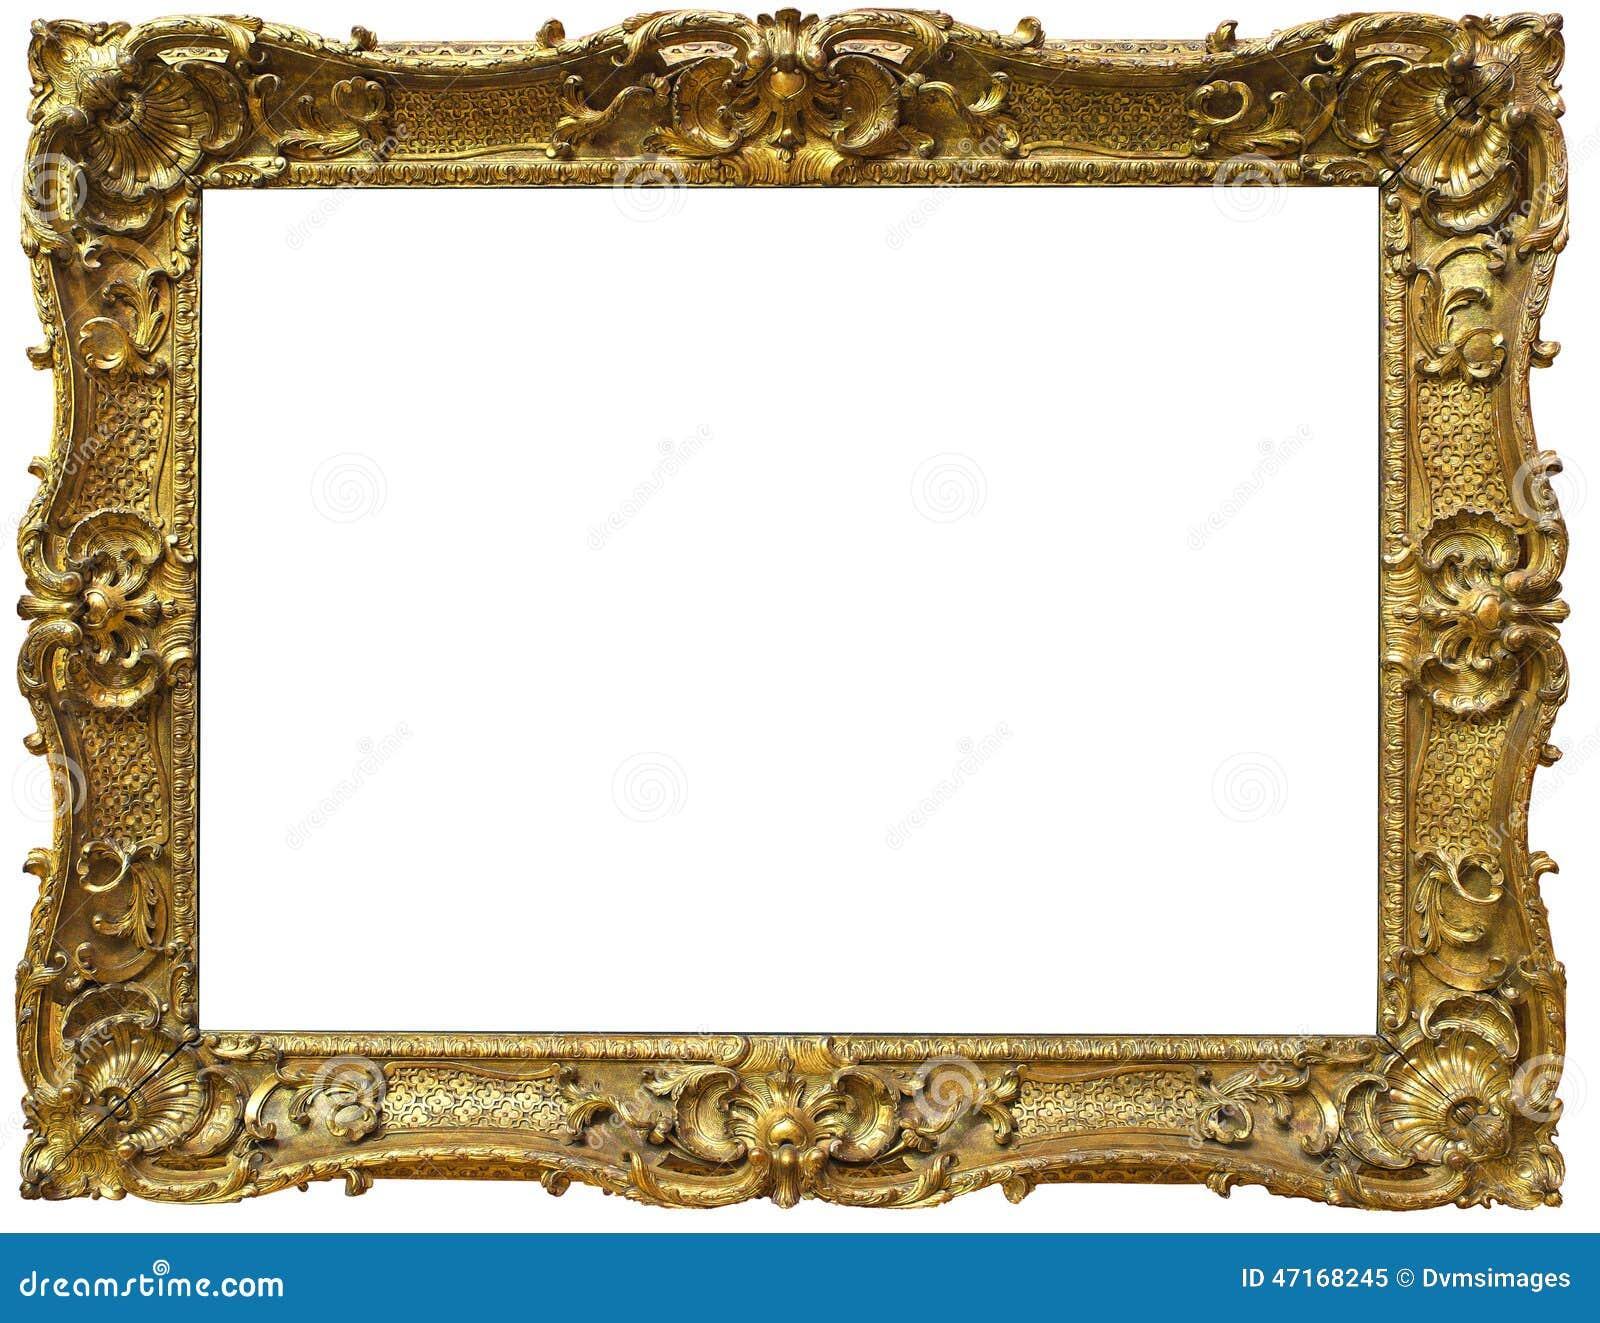 Overladen Barok Gouden Kader